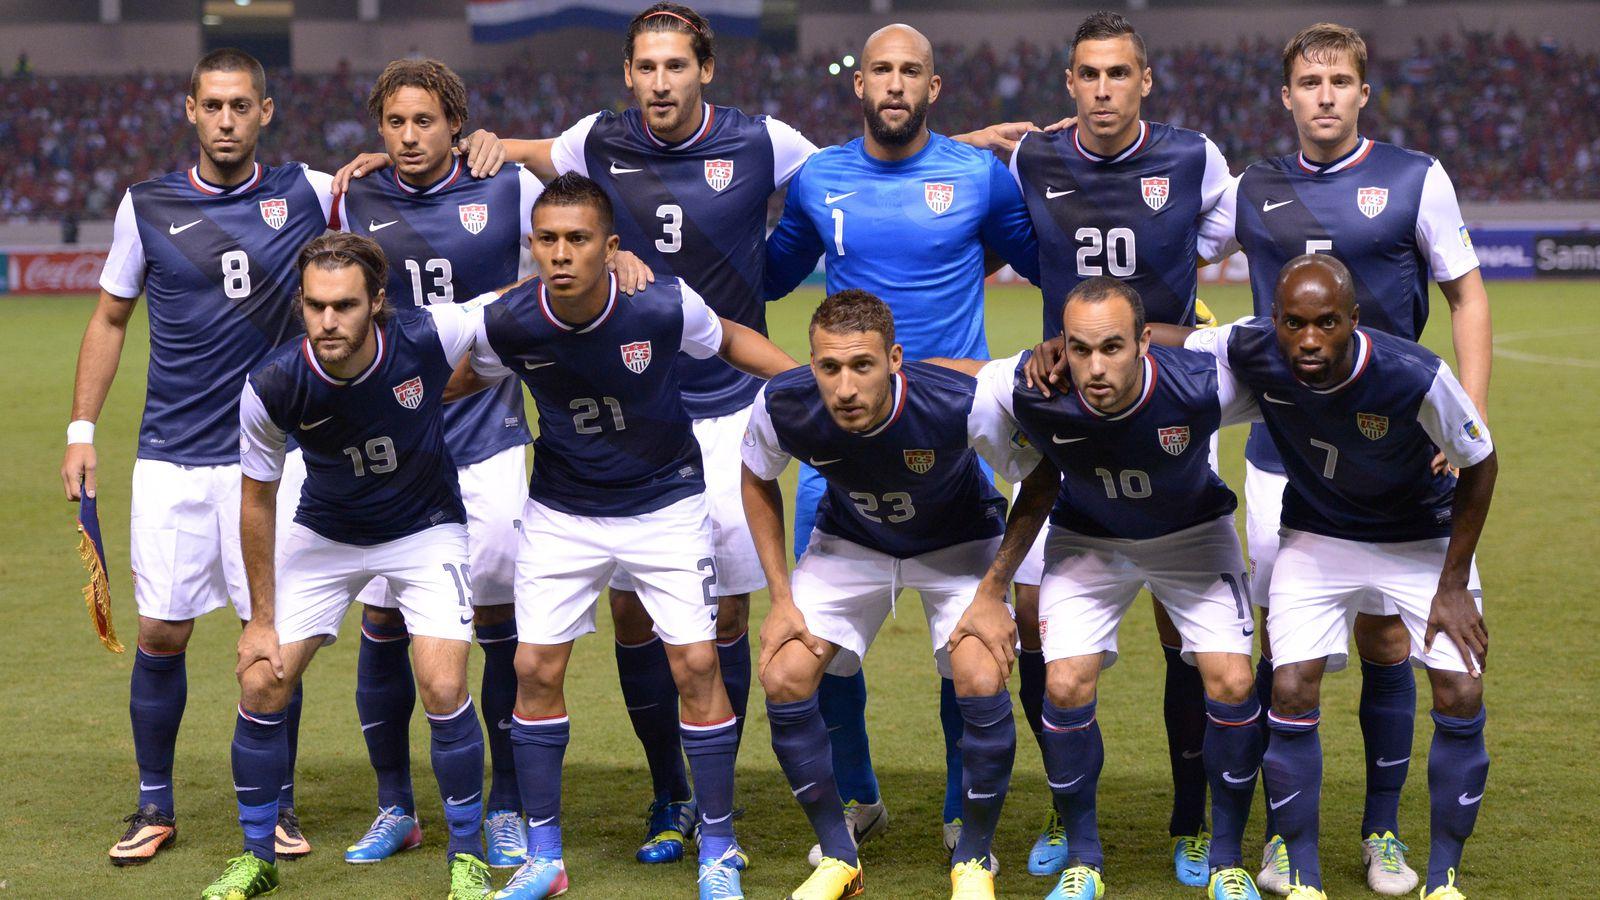 qu mens soccer team - HD1200×1200